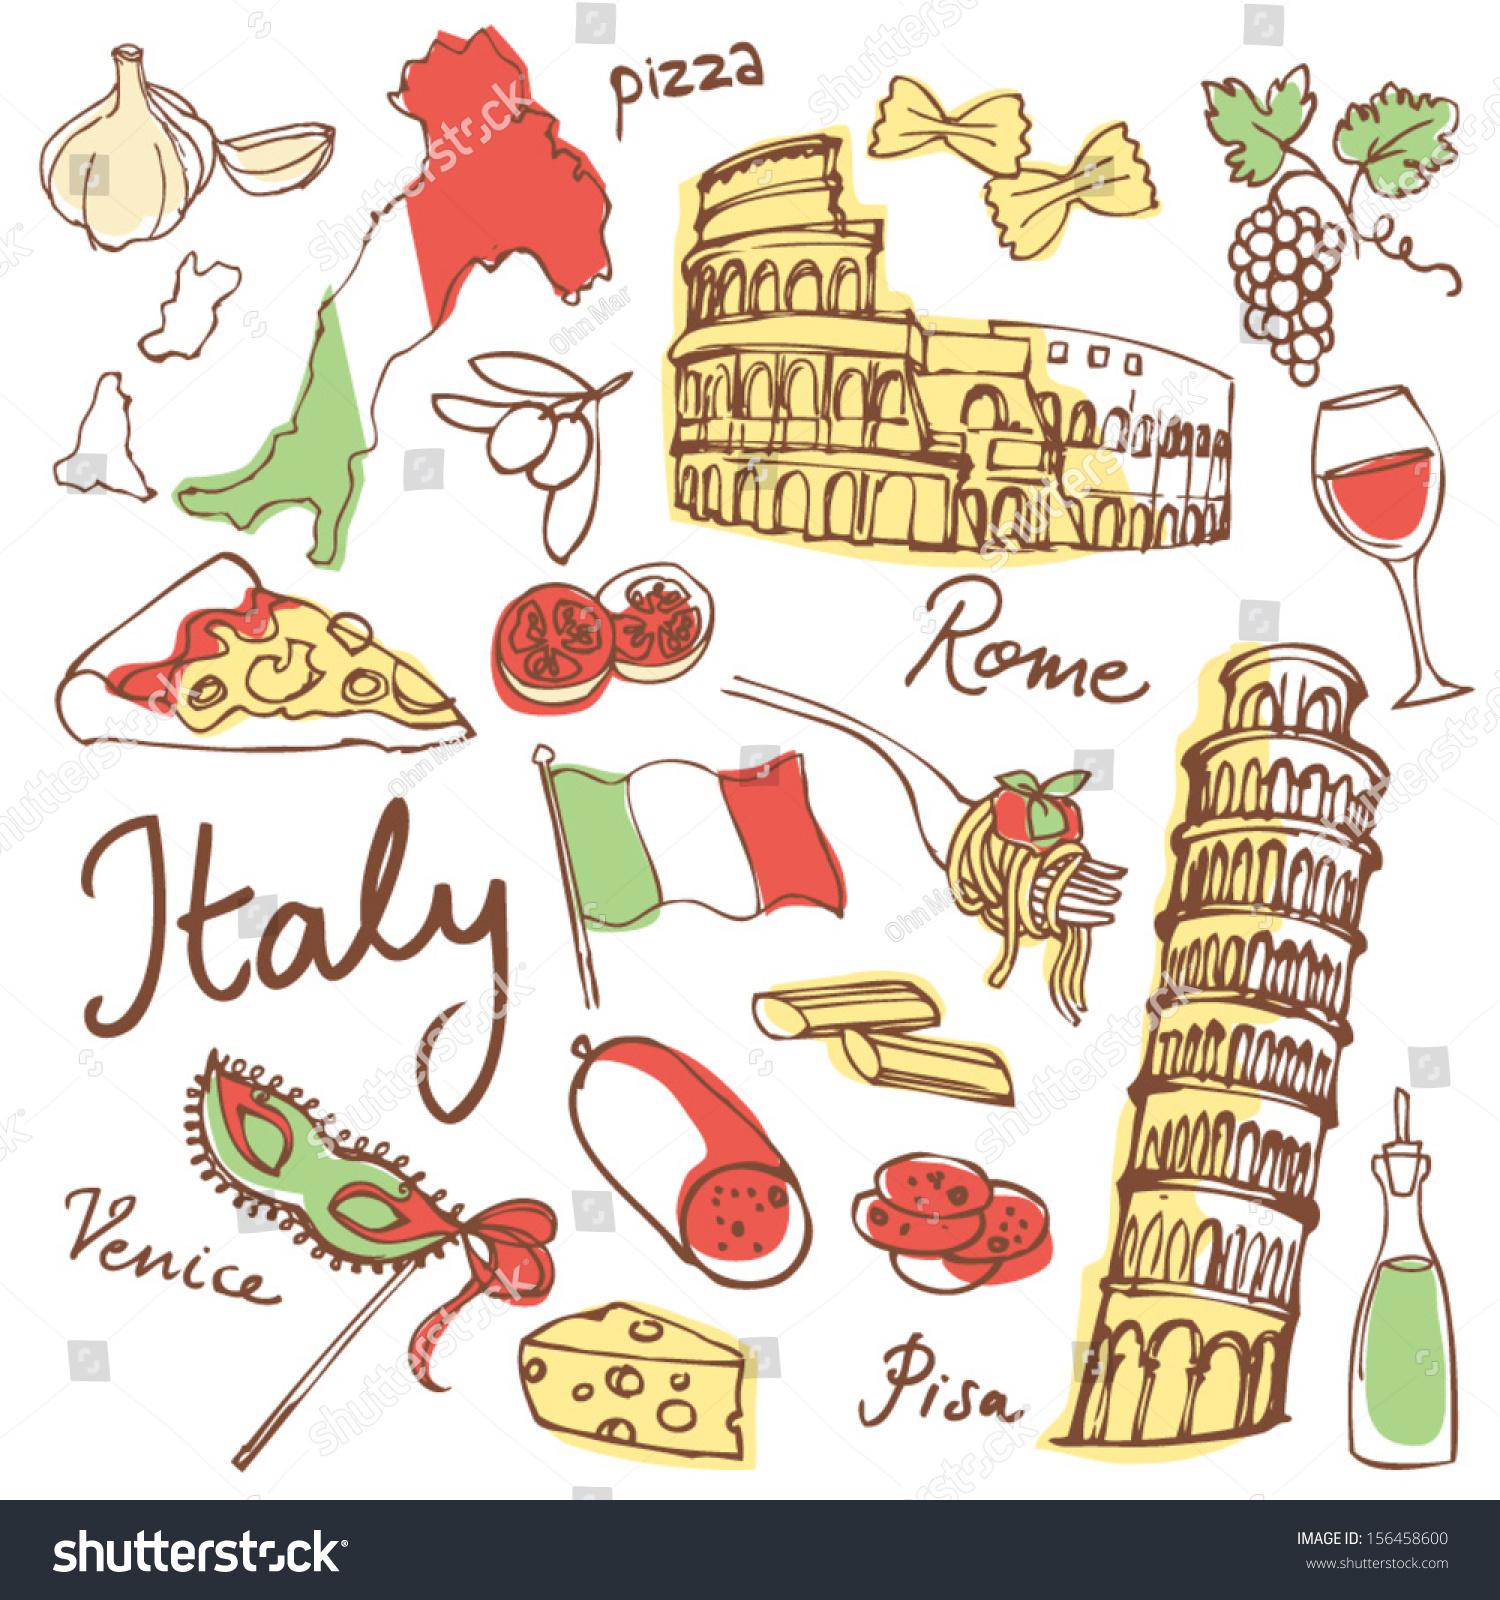 Italian Restaurant Logo With Flag: Set Italy Icons Vector Illustration Stock Vector 156458600